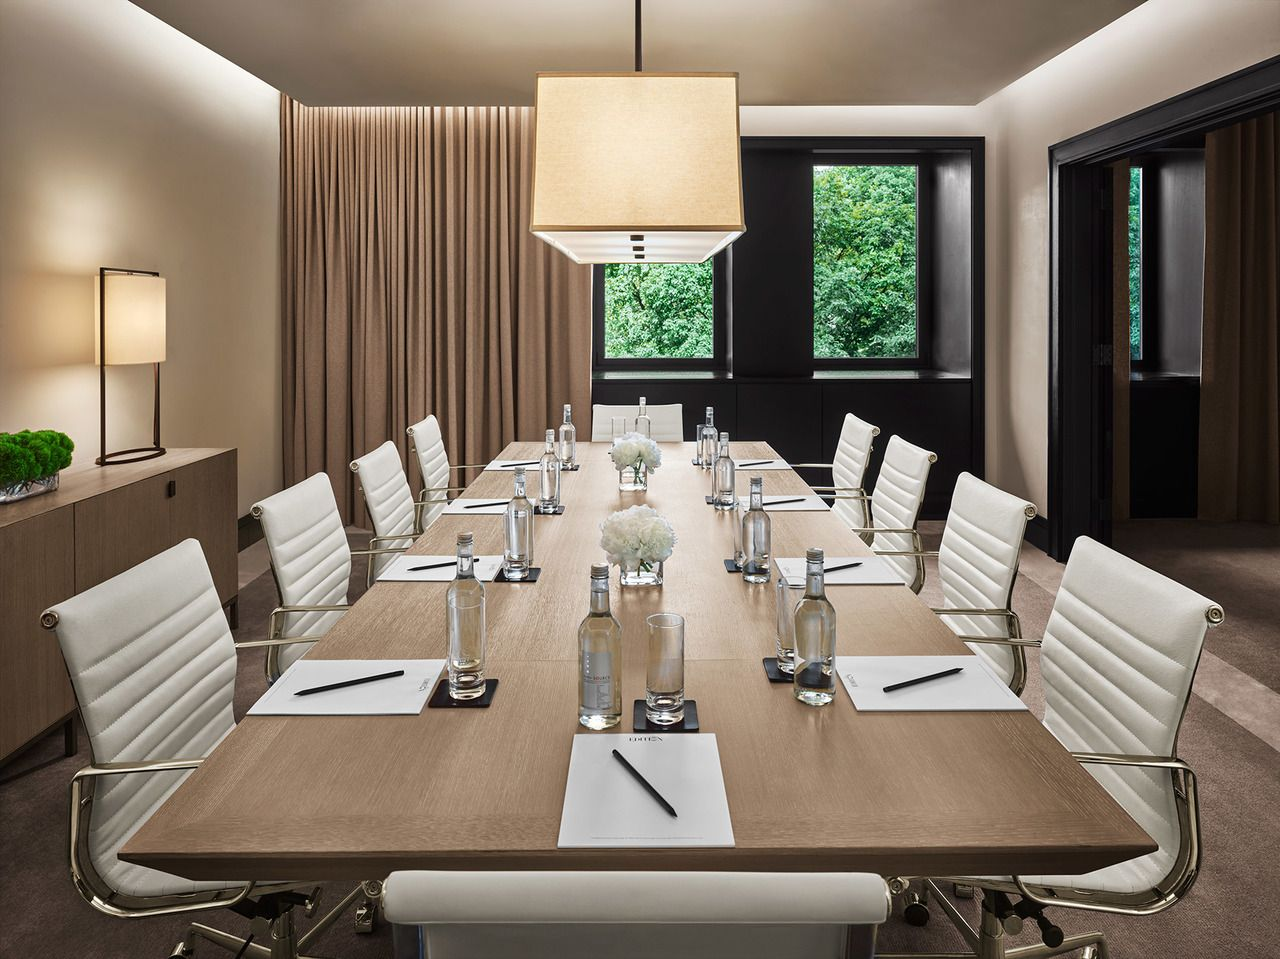 New York Edition Hotel Meeting Room Hotel Design